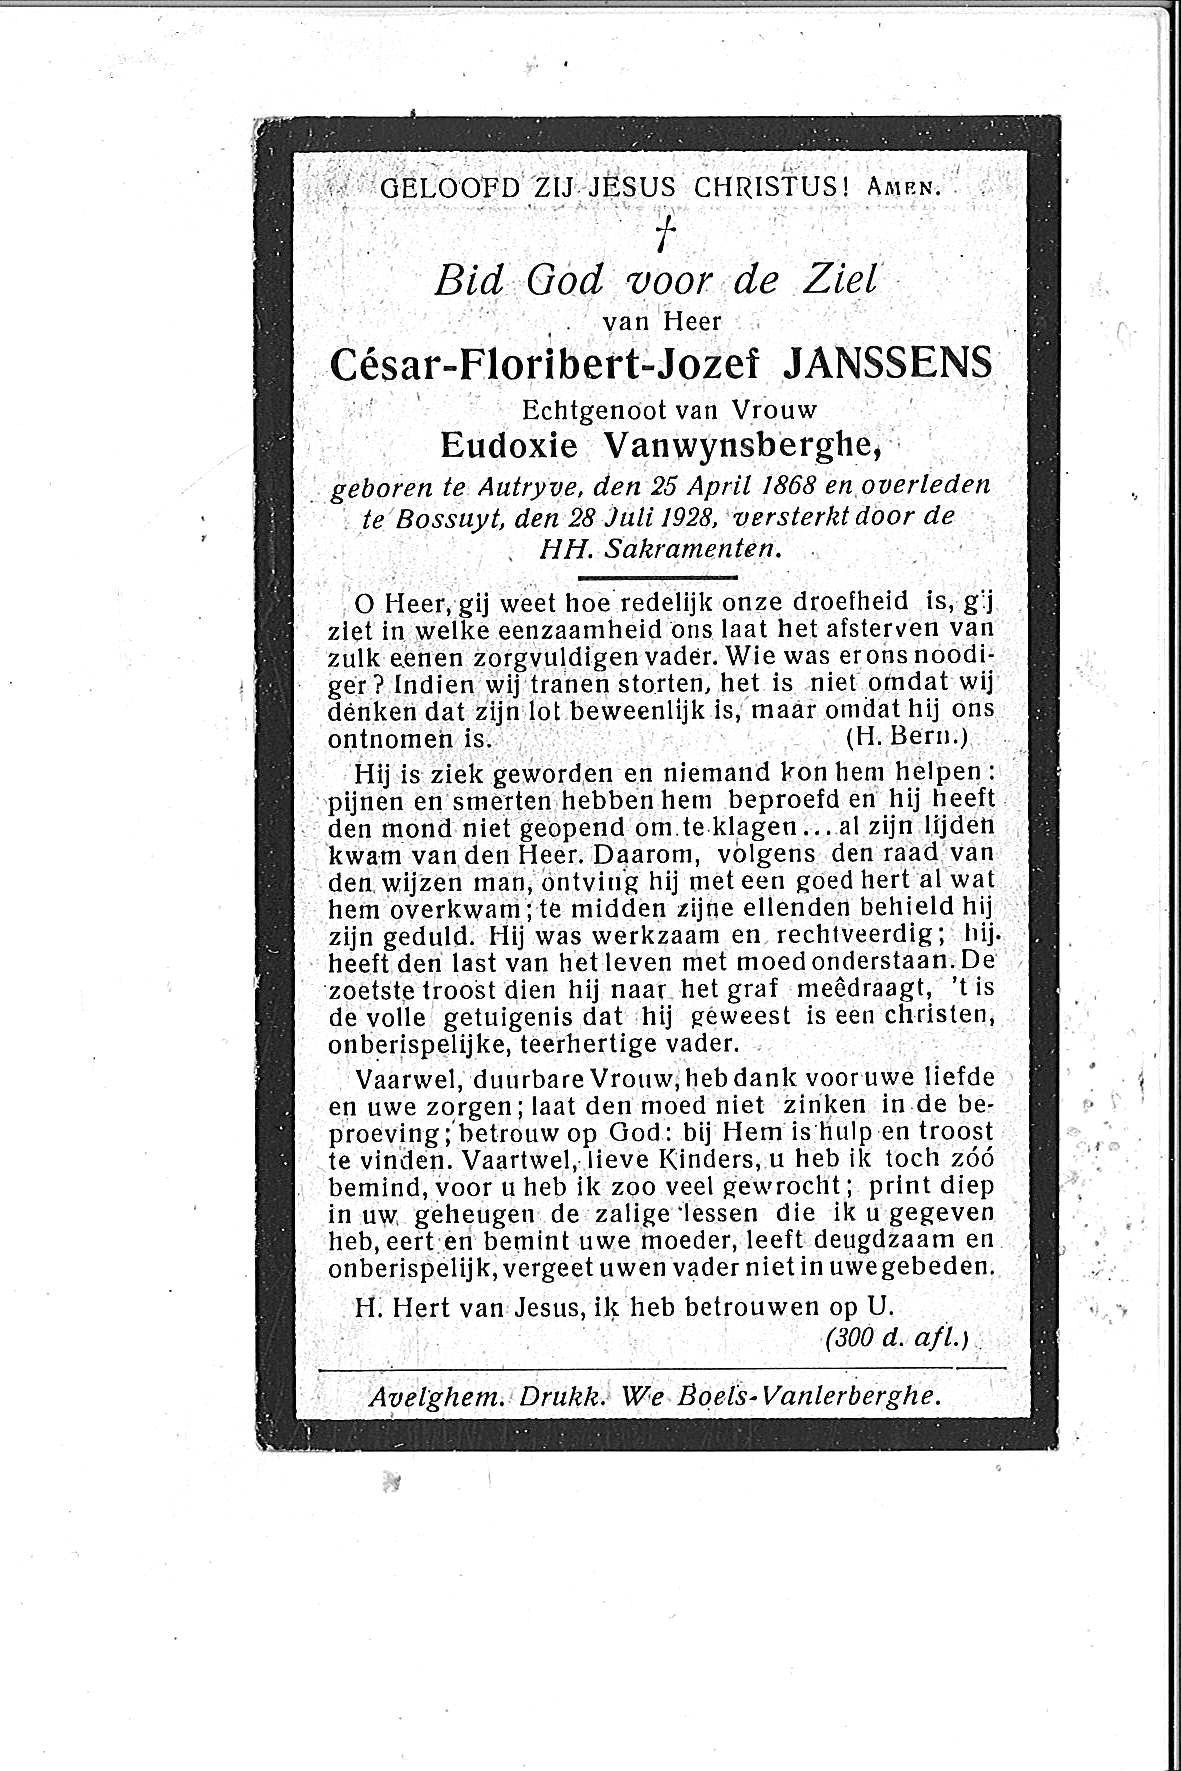 César-Floribert-Jozef(1928)20150323095338_00049.jpg